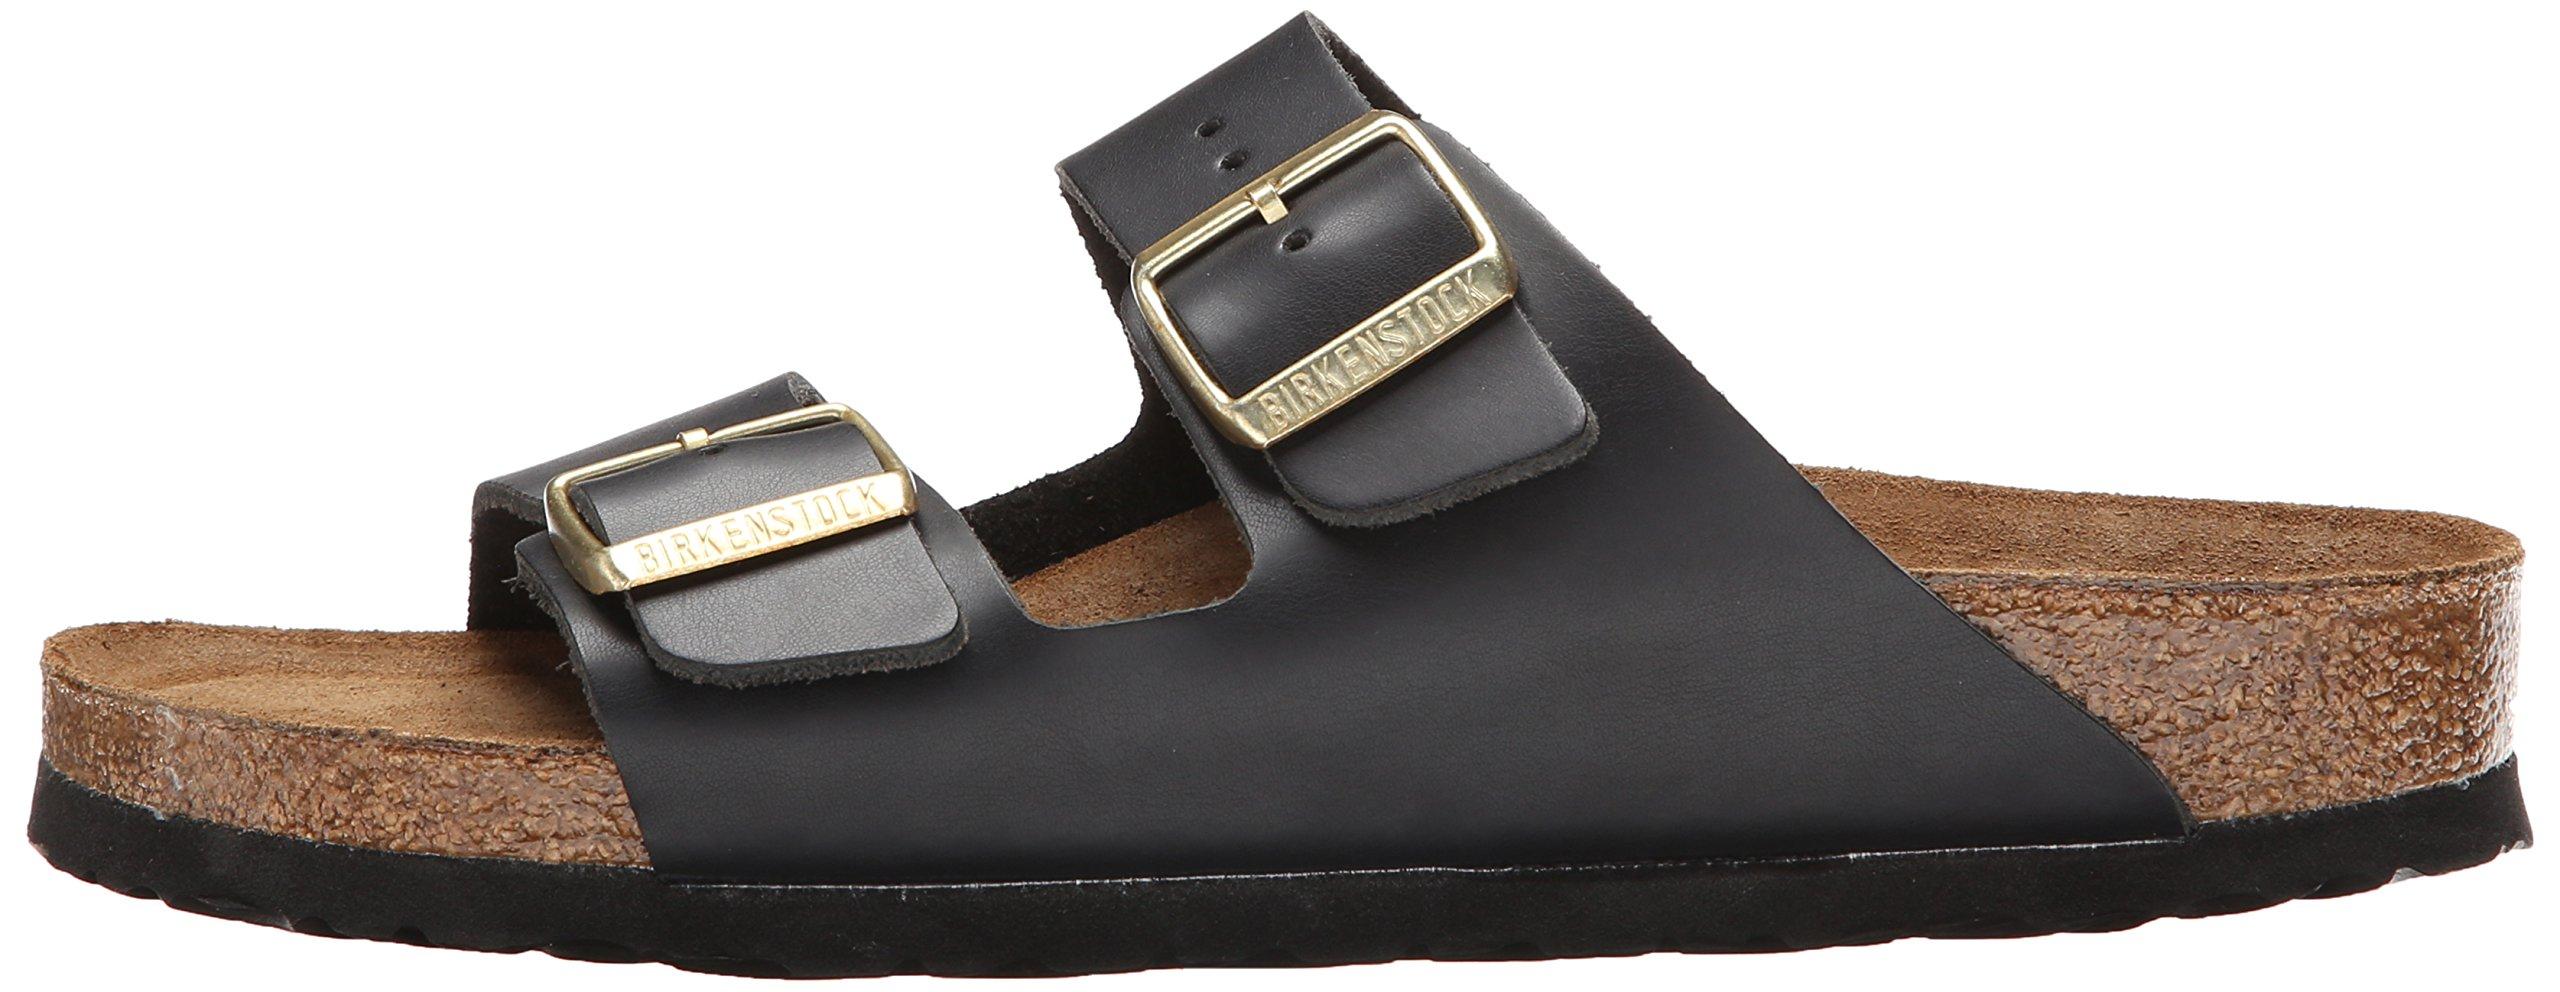 Birkenstock Unisex Arizona Hunter Black Leather Sandals - 9-9.5 2A(N) US Women/7-7.5 2A(N) US Men by Birkenstock (Image #5)